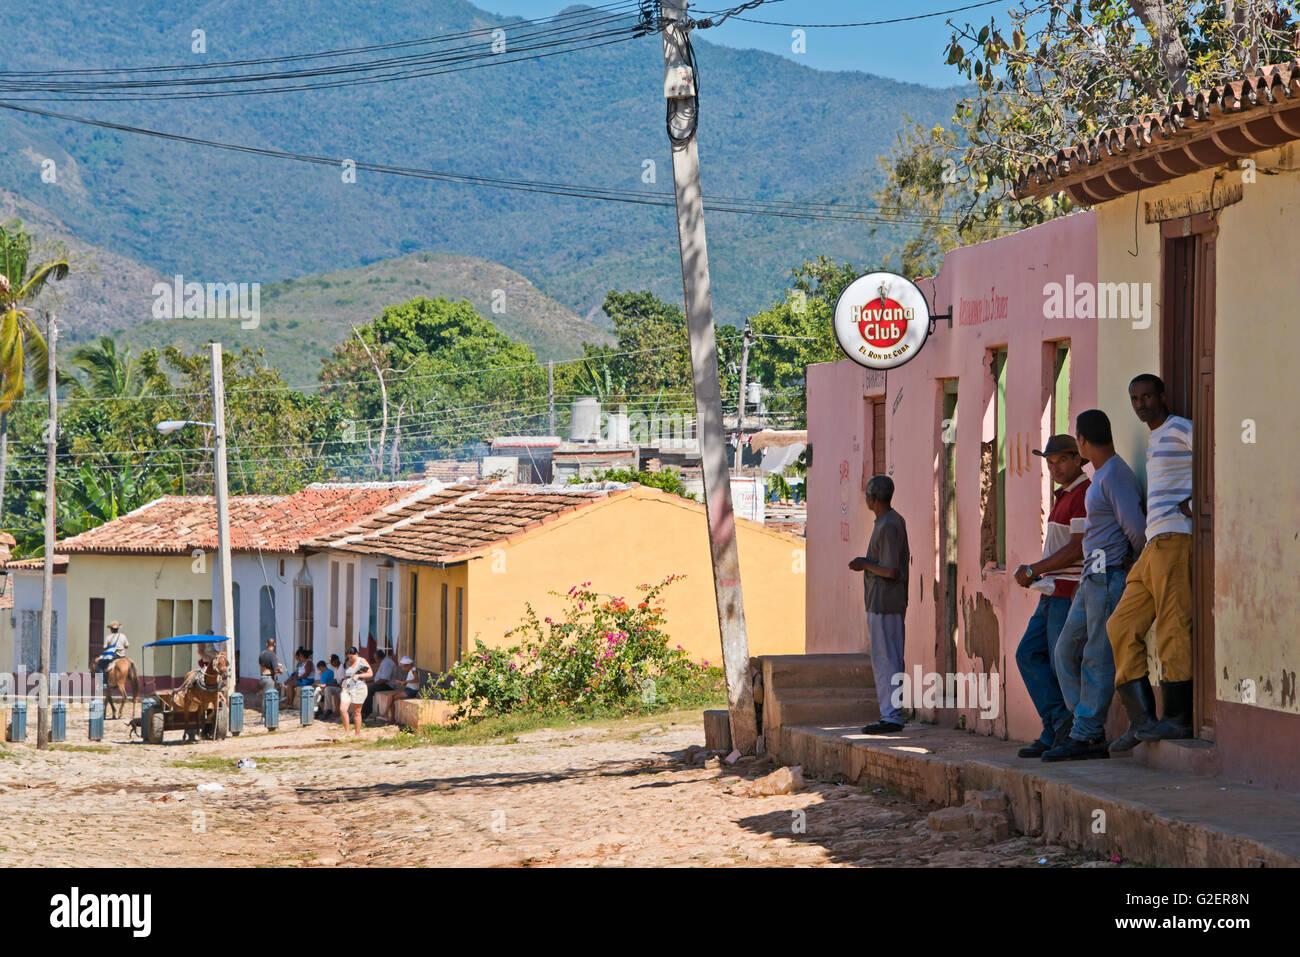 Horizontal street view in Trinidad, Cuba. Stock Photo